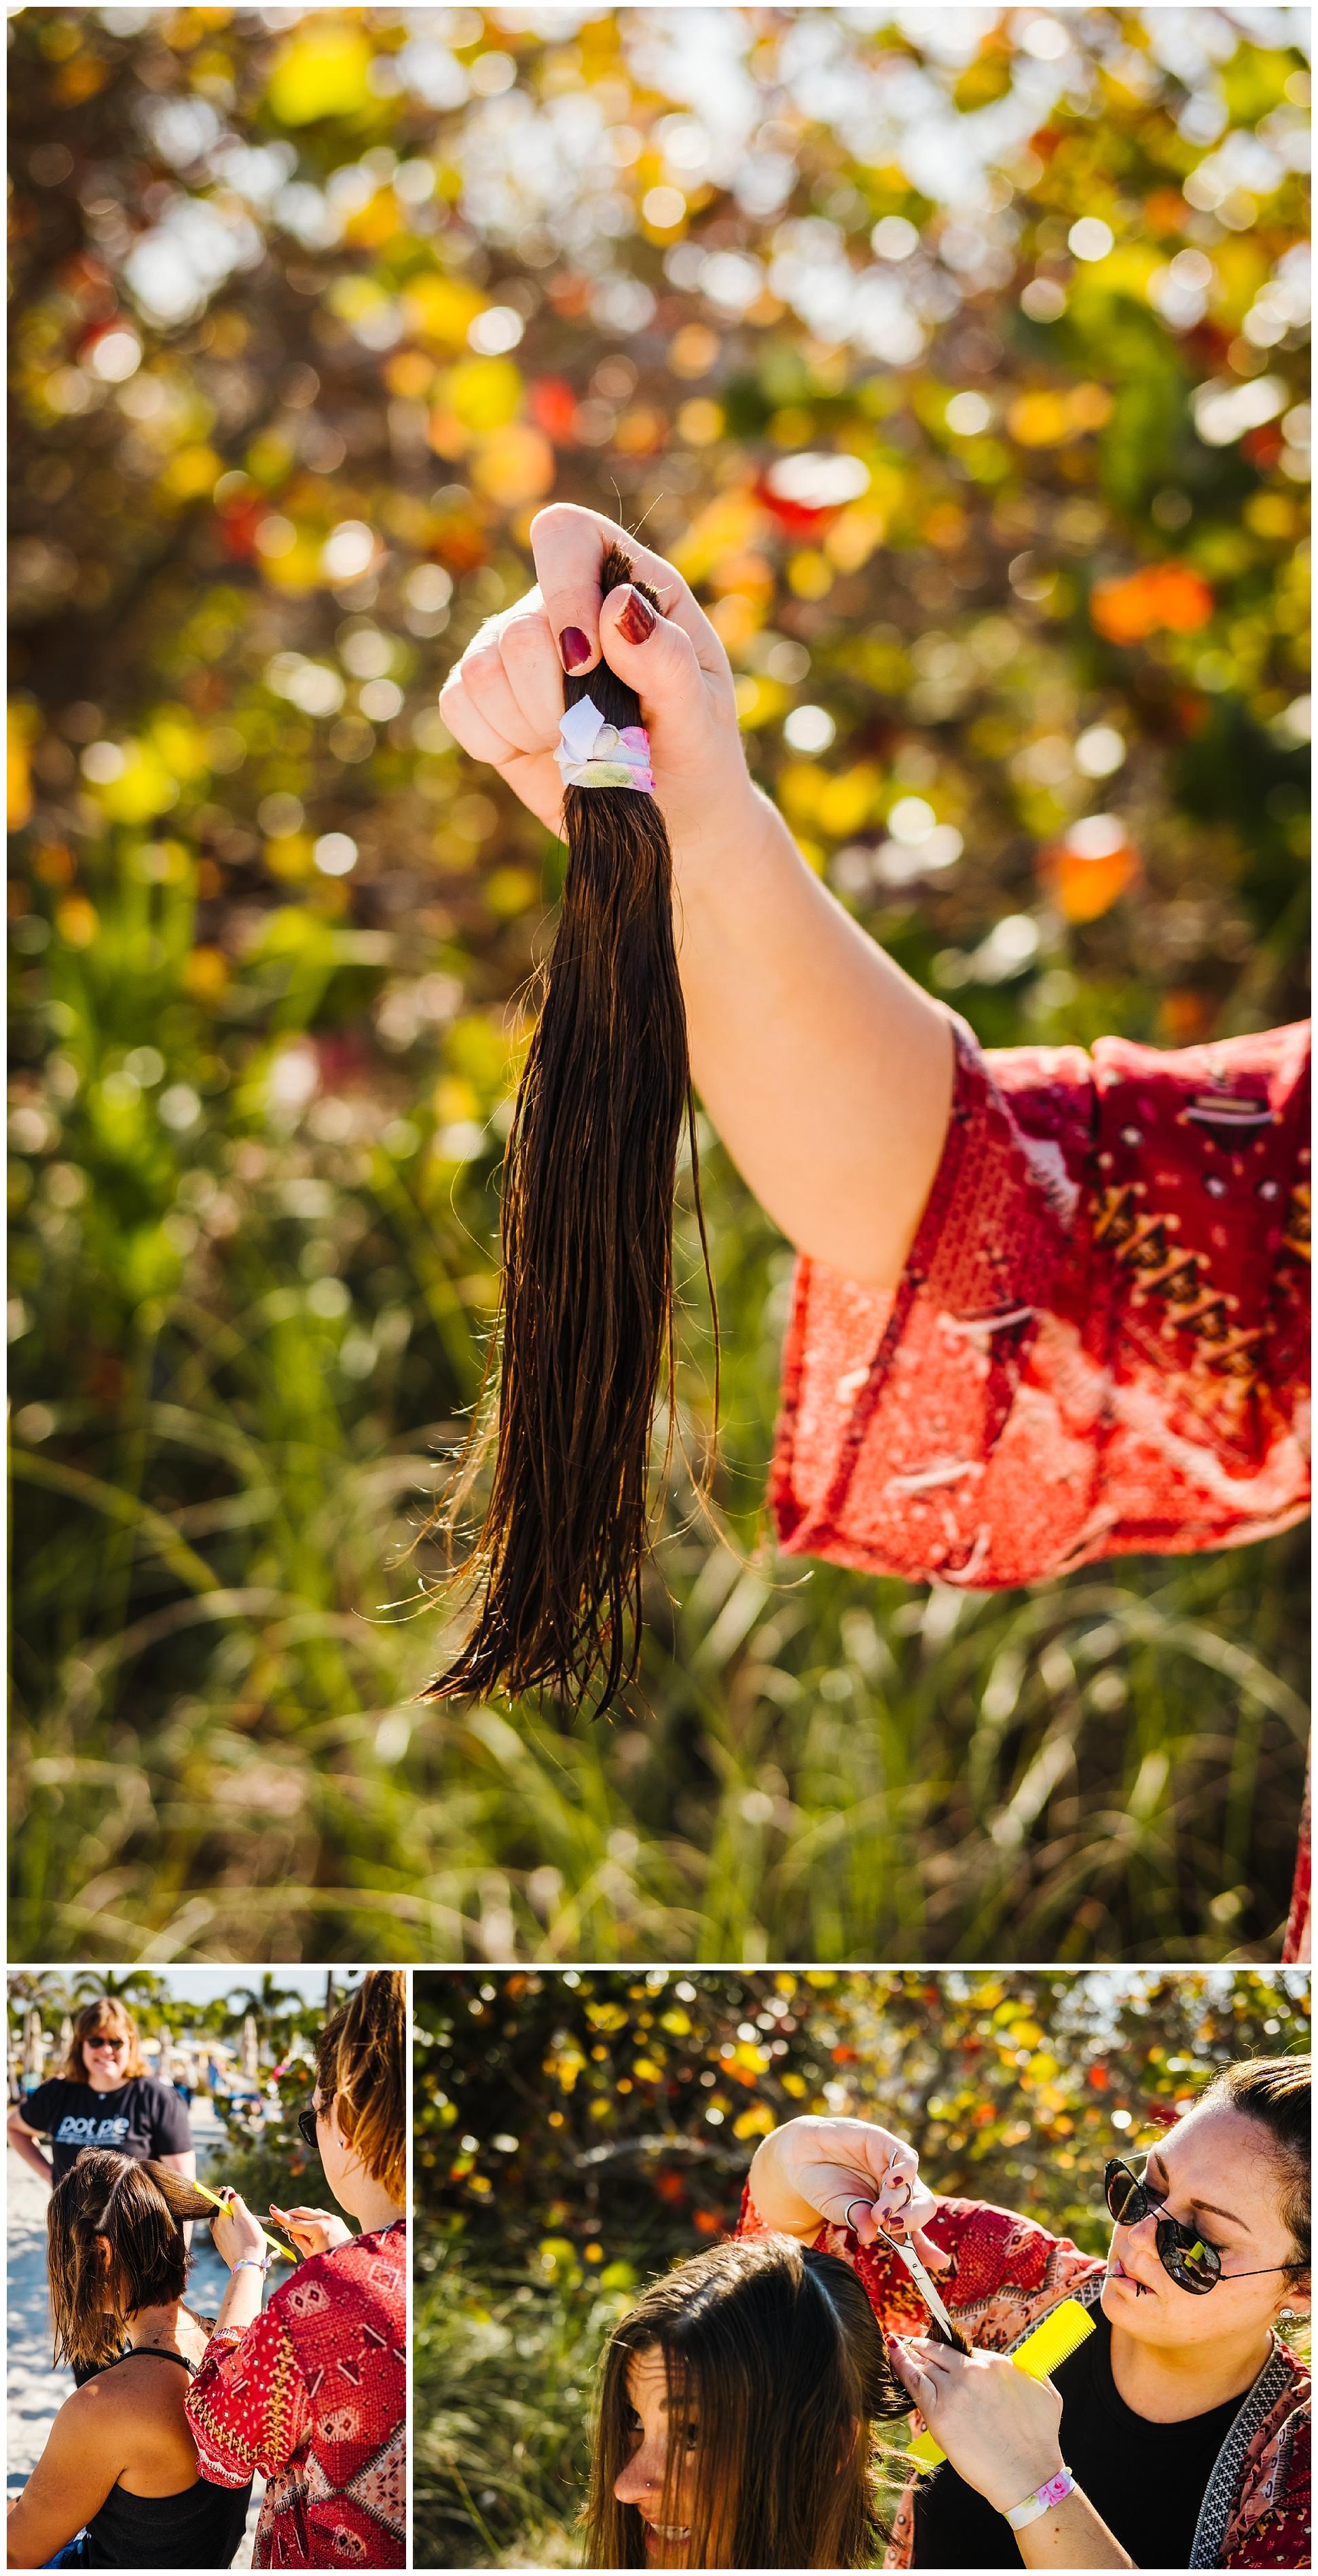 Tampa-wedding-photographer-locks-of-love-bride-hair-donation-cancer-awareness_0004.jpg